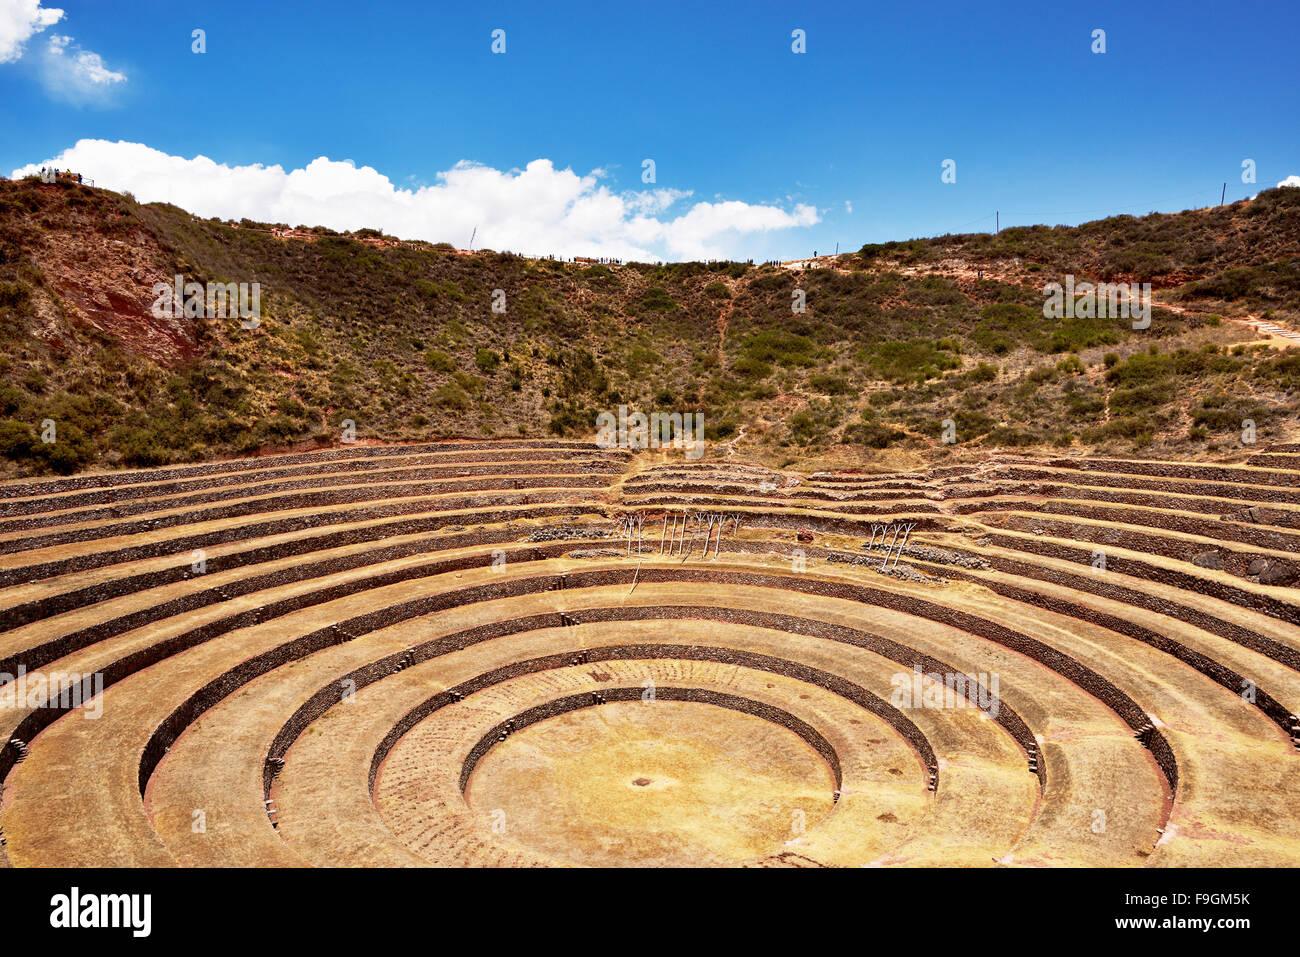 Inka-Terrassen im Heiligen Tal, Landwirtschaft, Moray, Ollantaytambo, Peru Stockbild